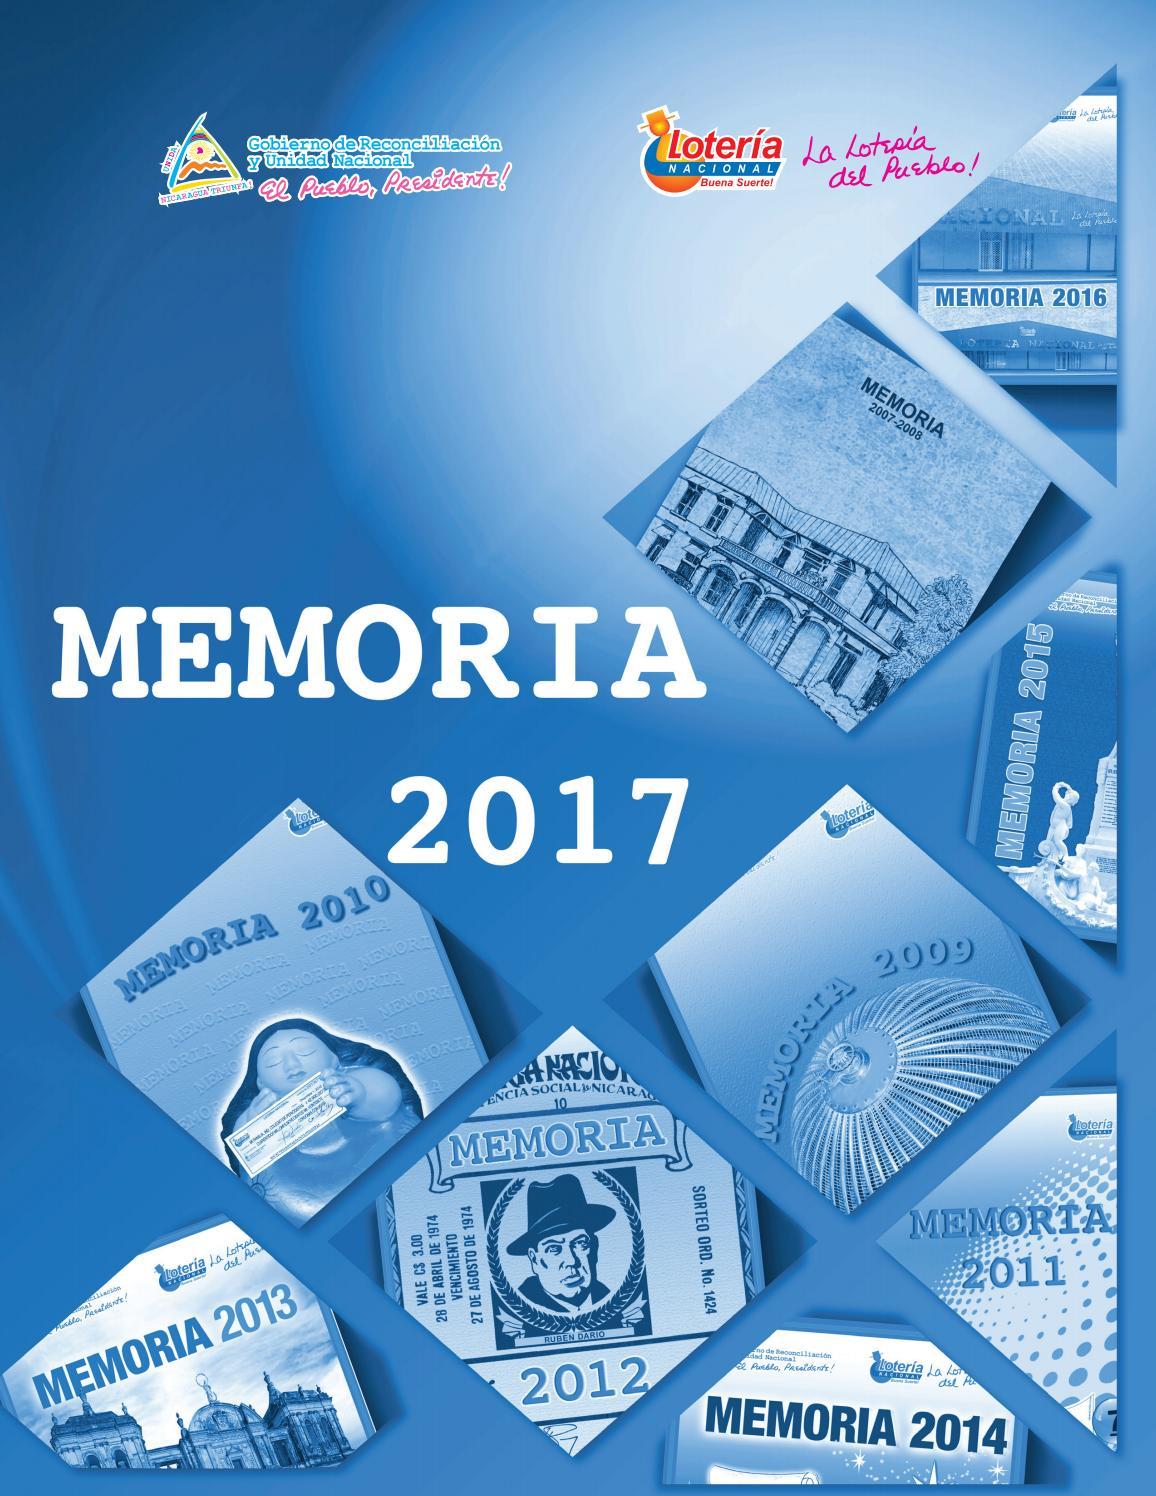 Memoria Institucional 2017 By Loteria De Nicaragua Issuu